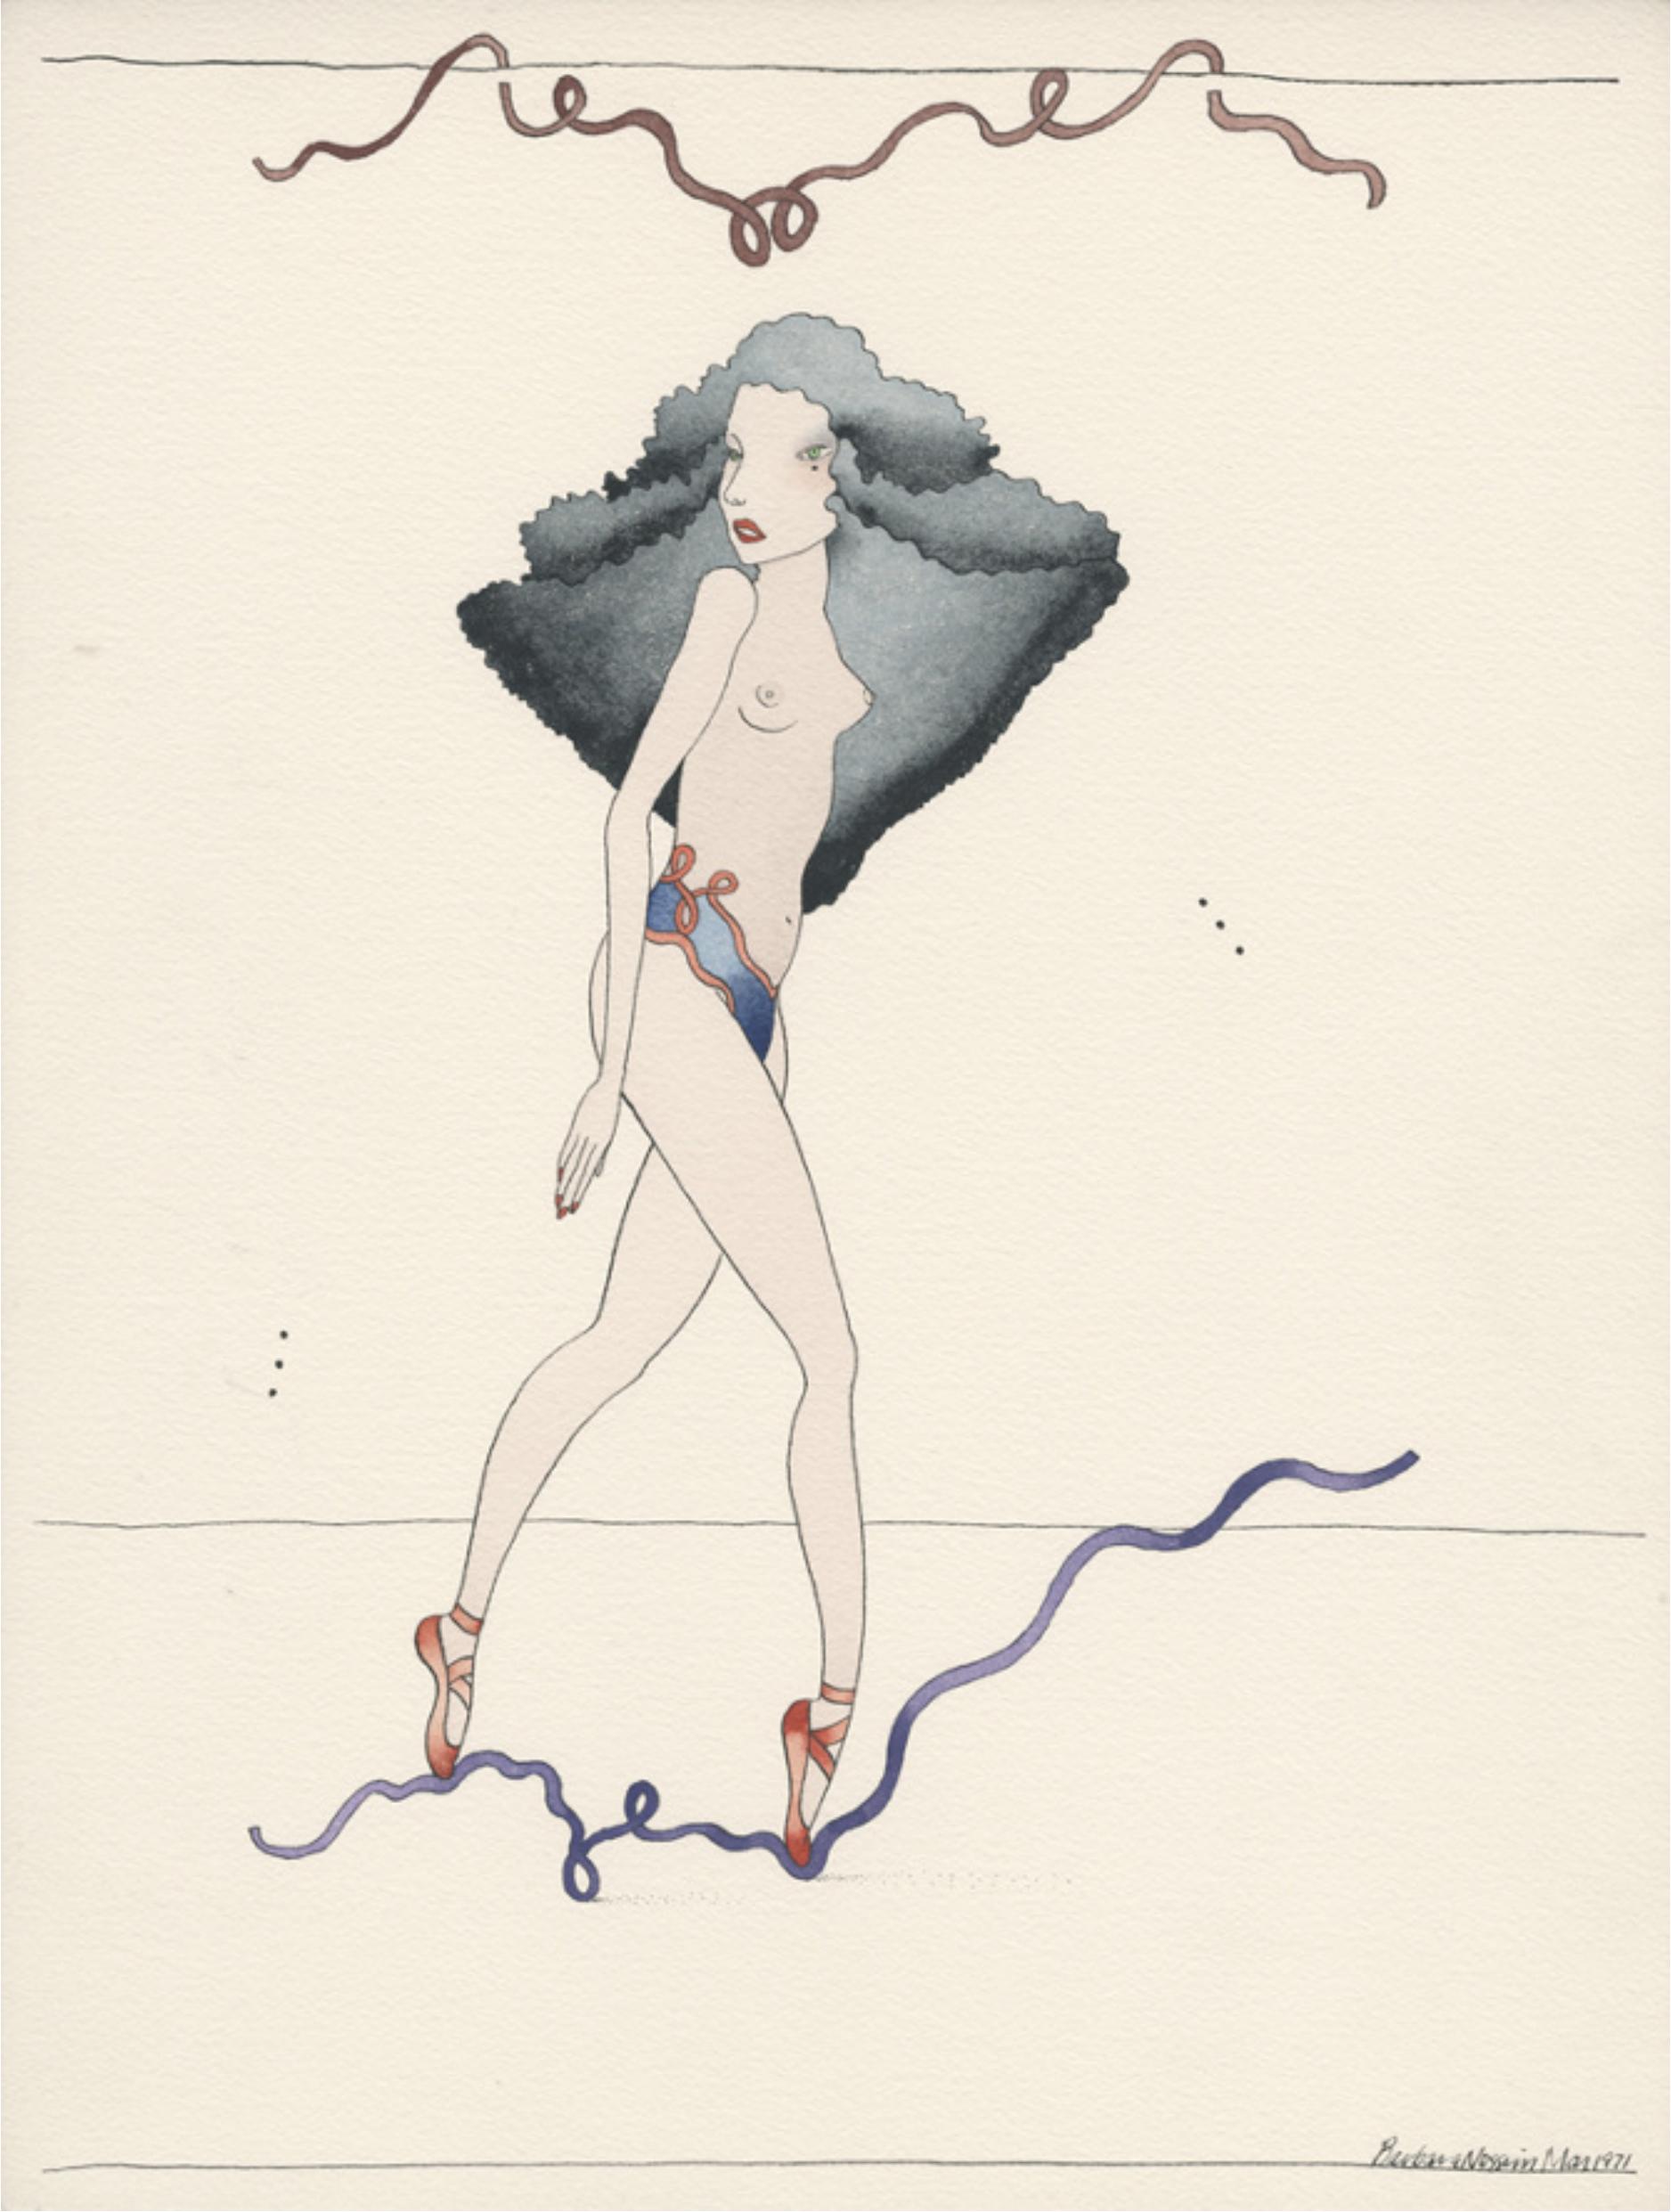 WomanGirl, 1971